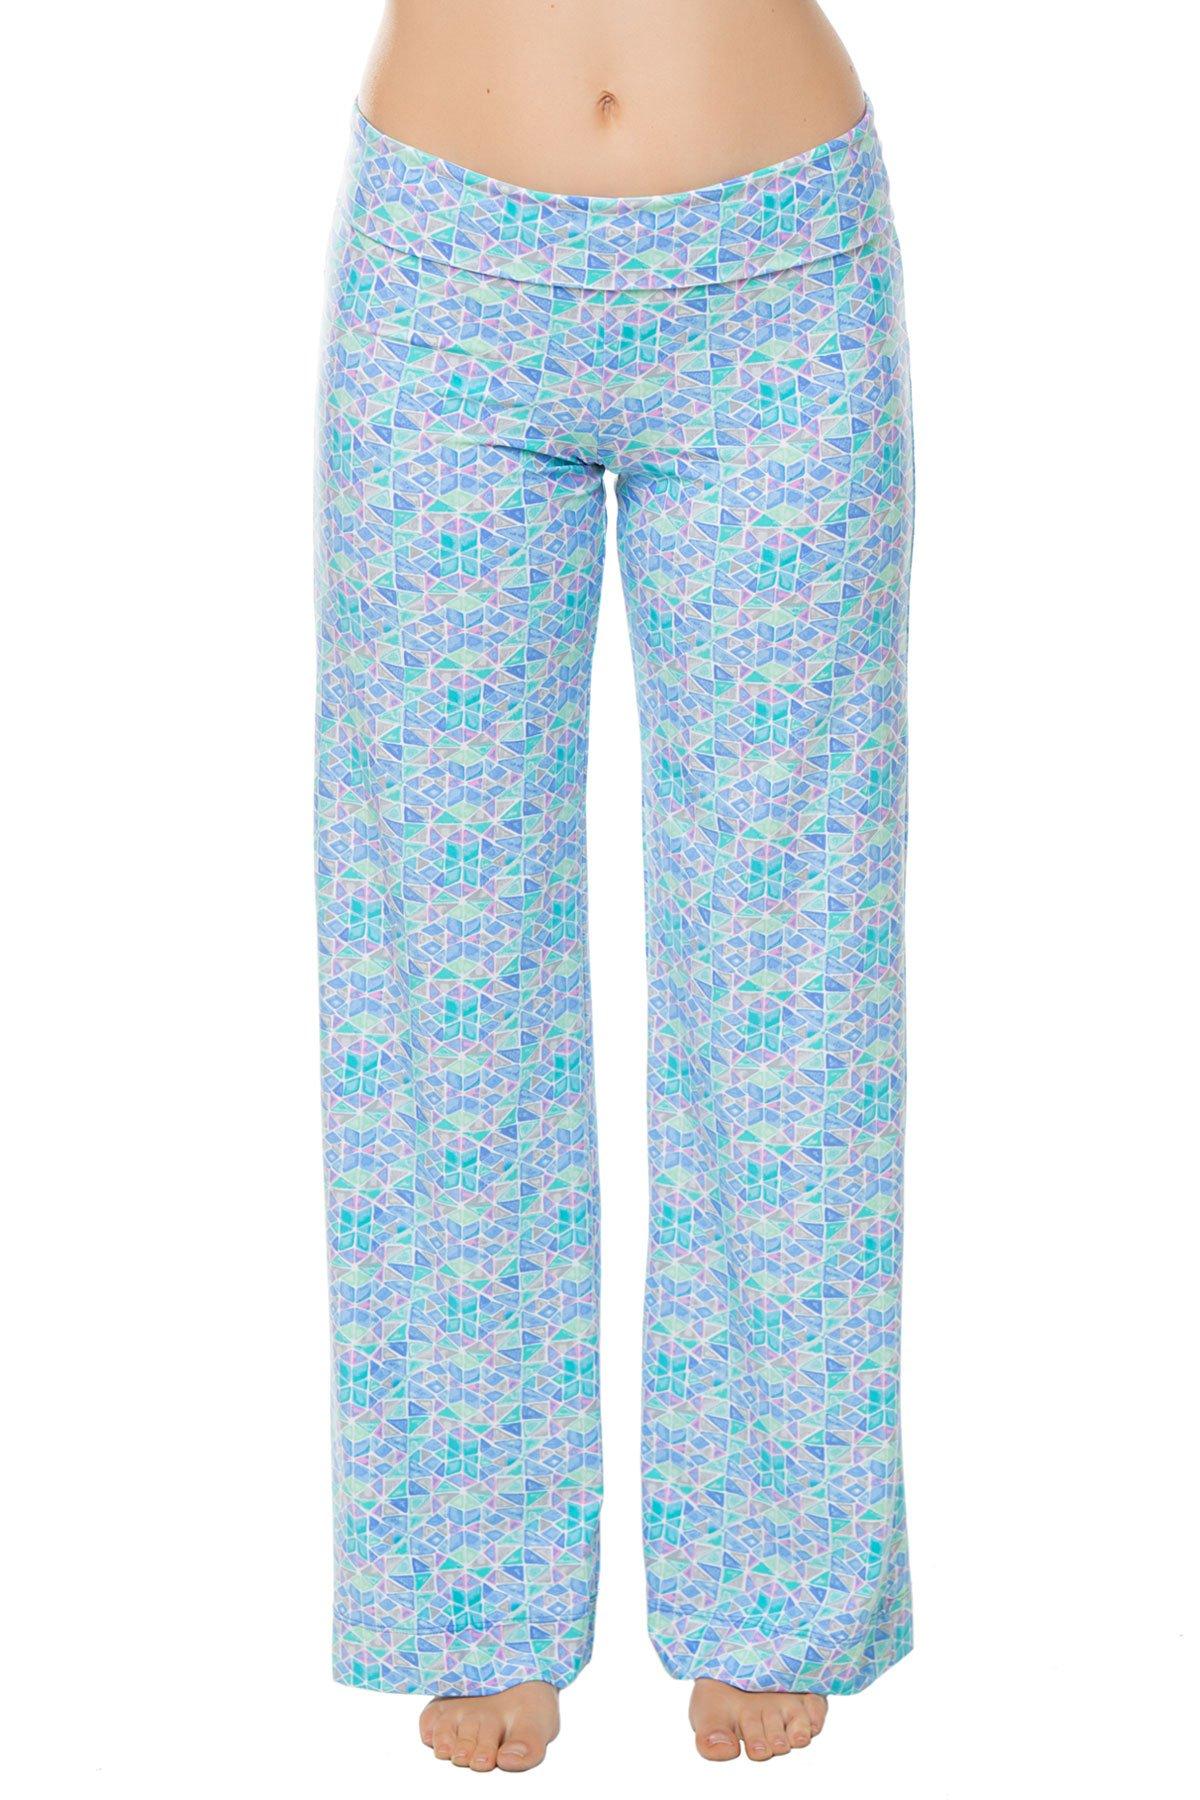 Helen Jon Women's Seaglass Pants Swim Cover Up Seaglass XS